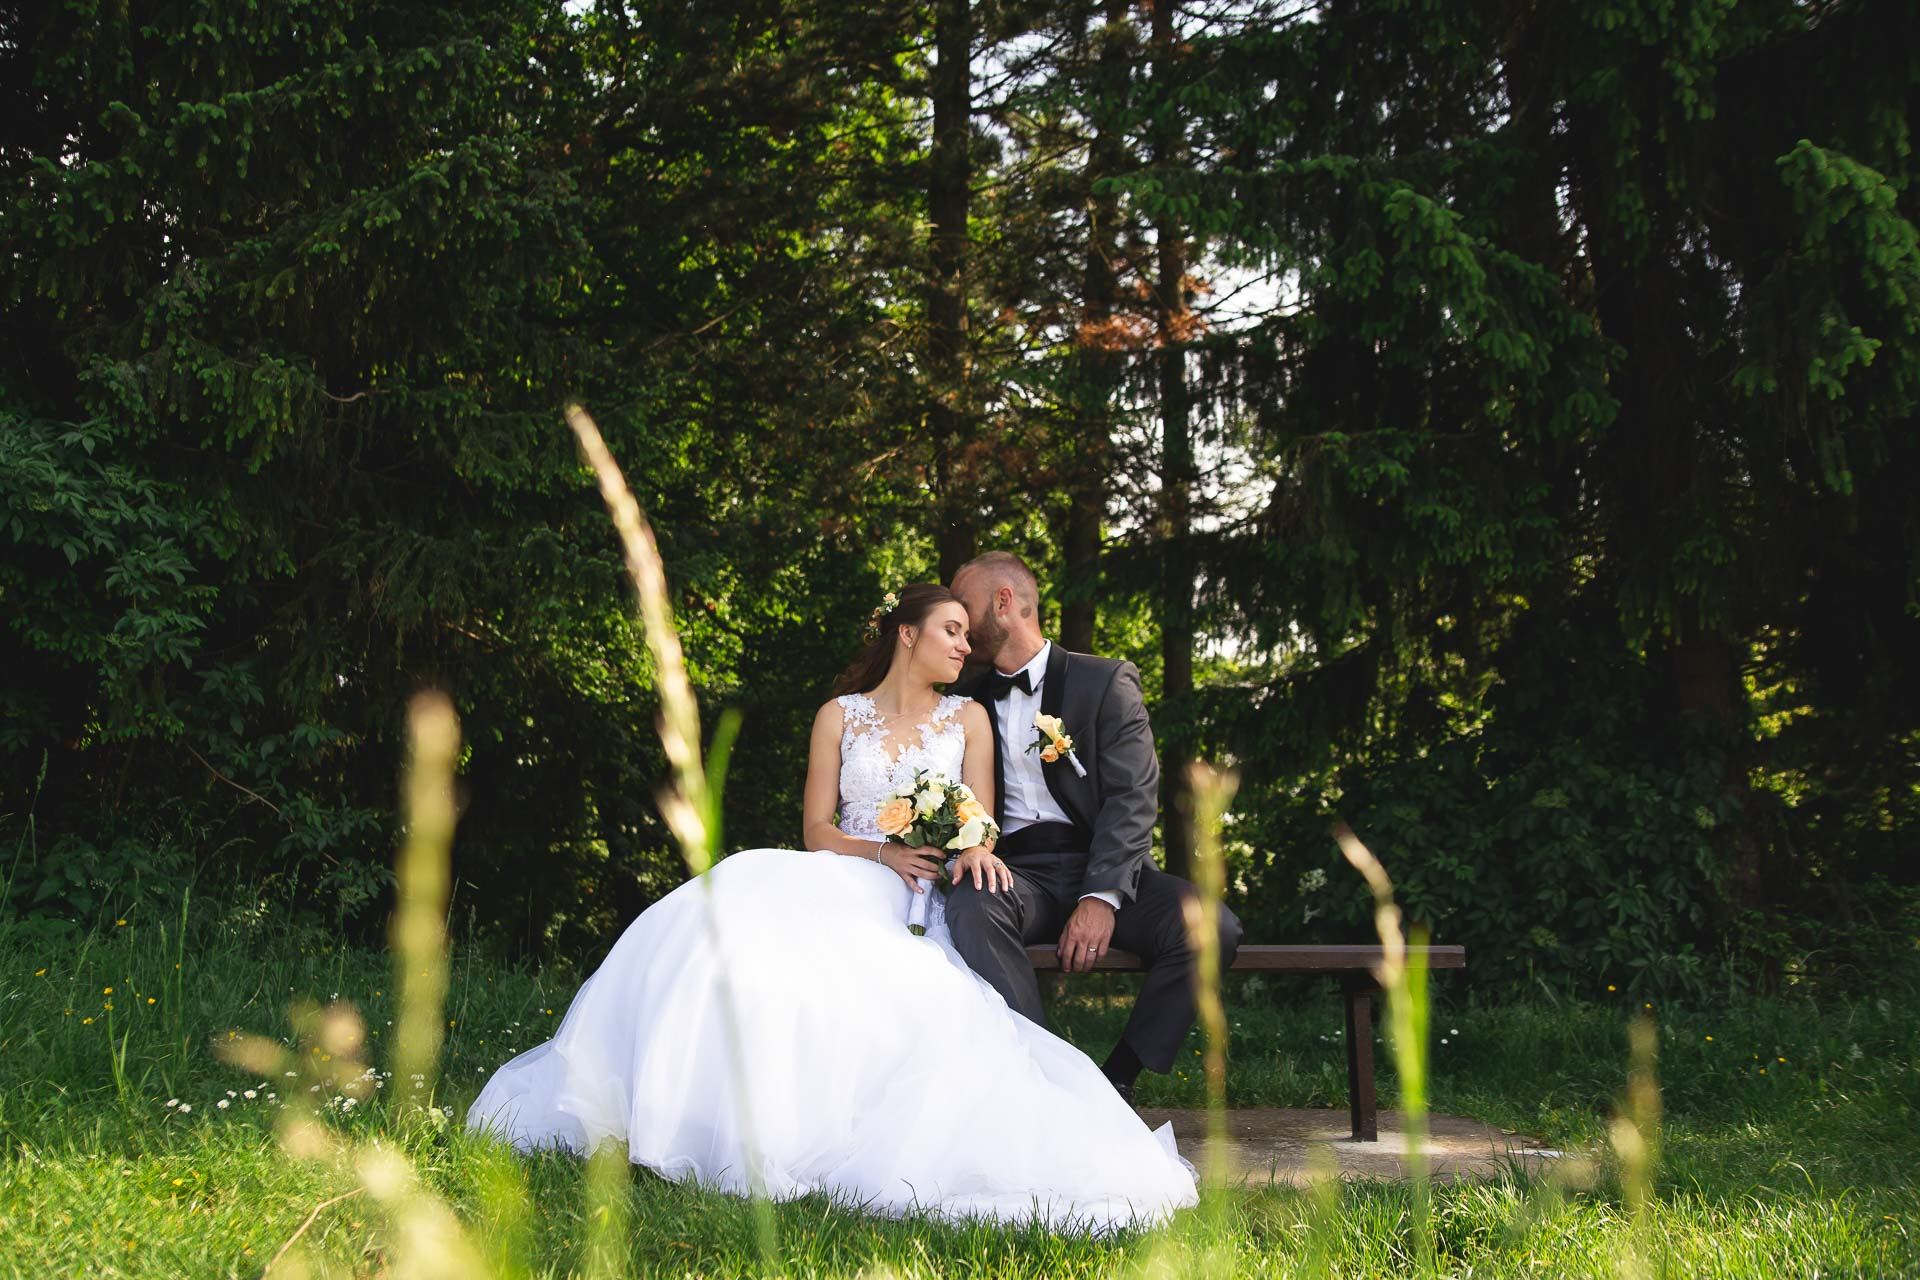 svatební-fotograf-svatebni-video-Nymburk-hotel-Ostrov-Beautyfoto-6230